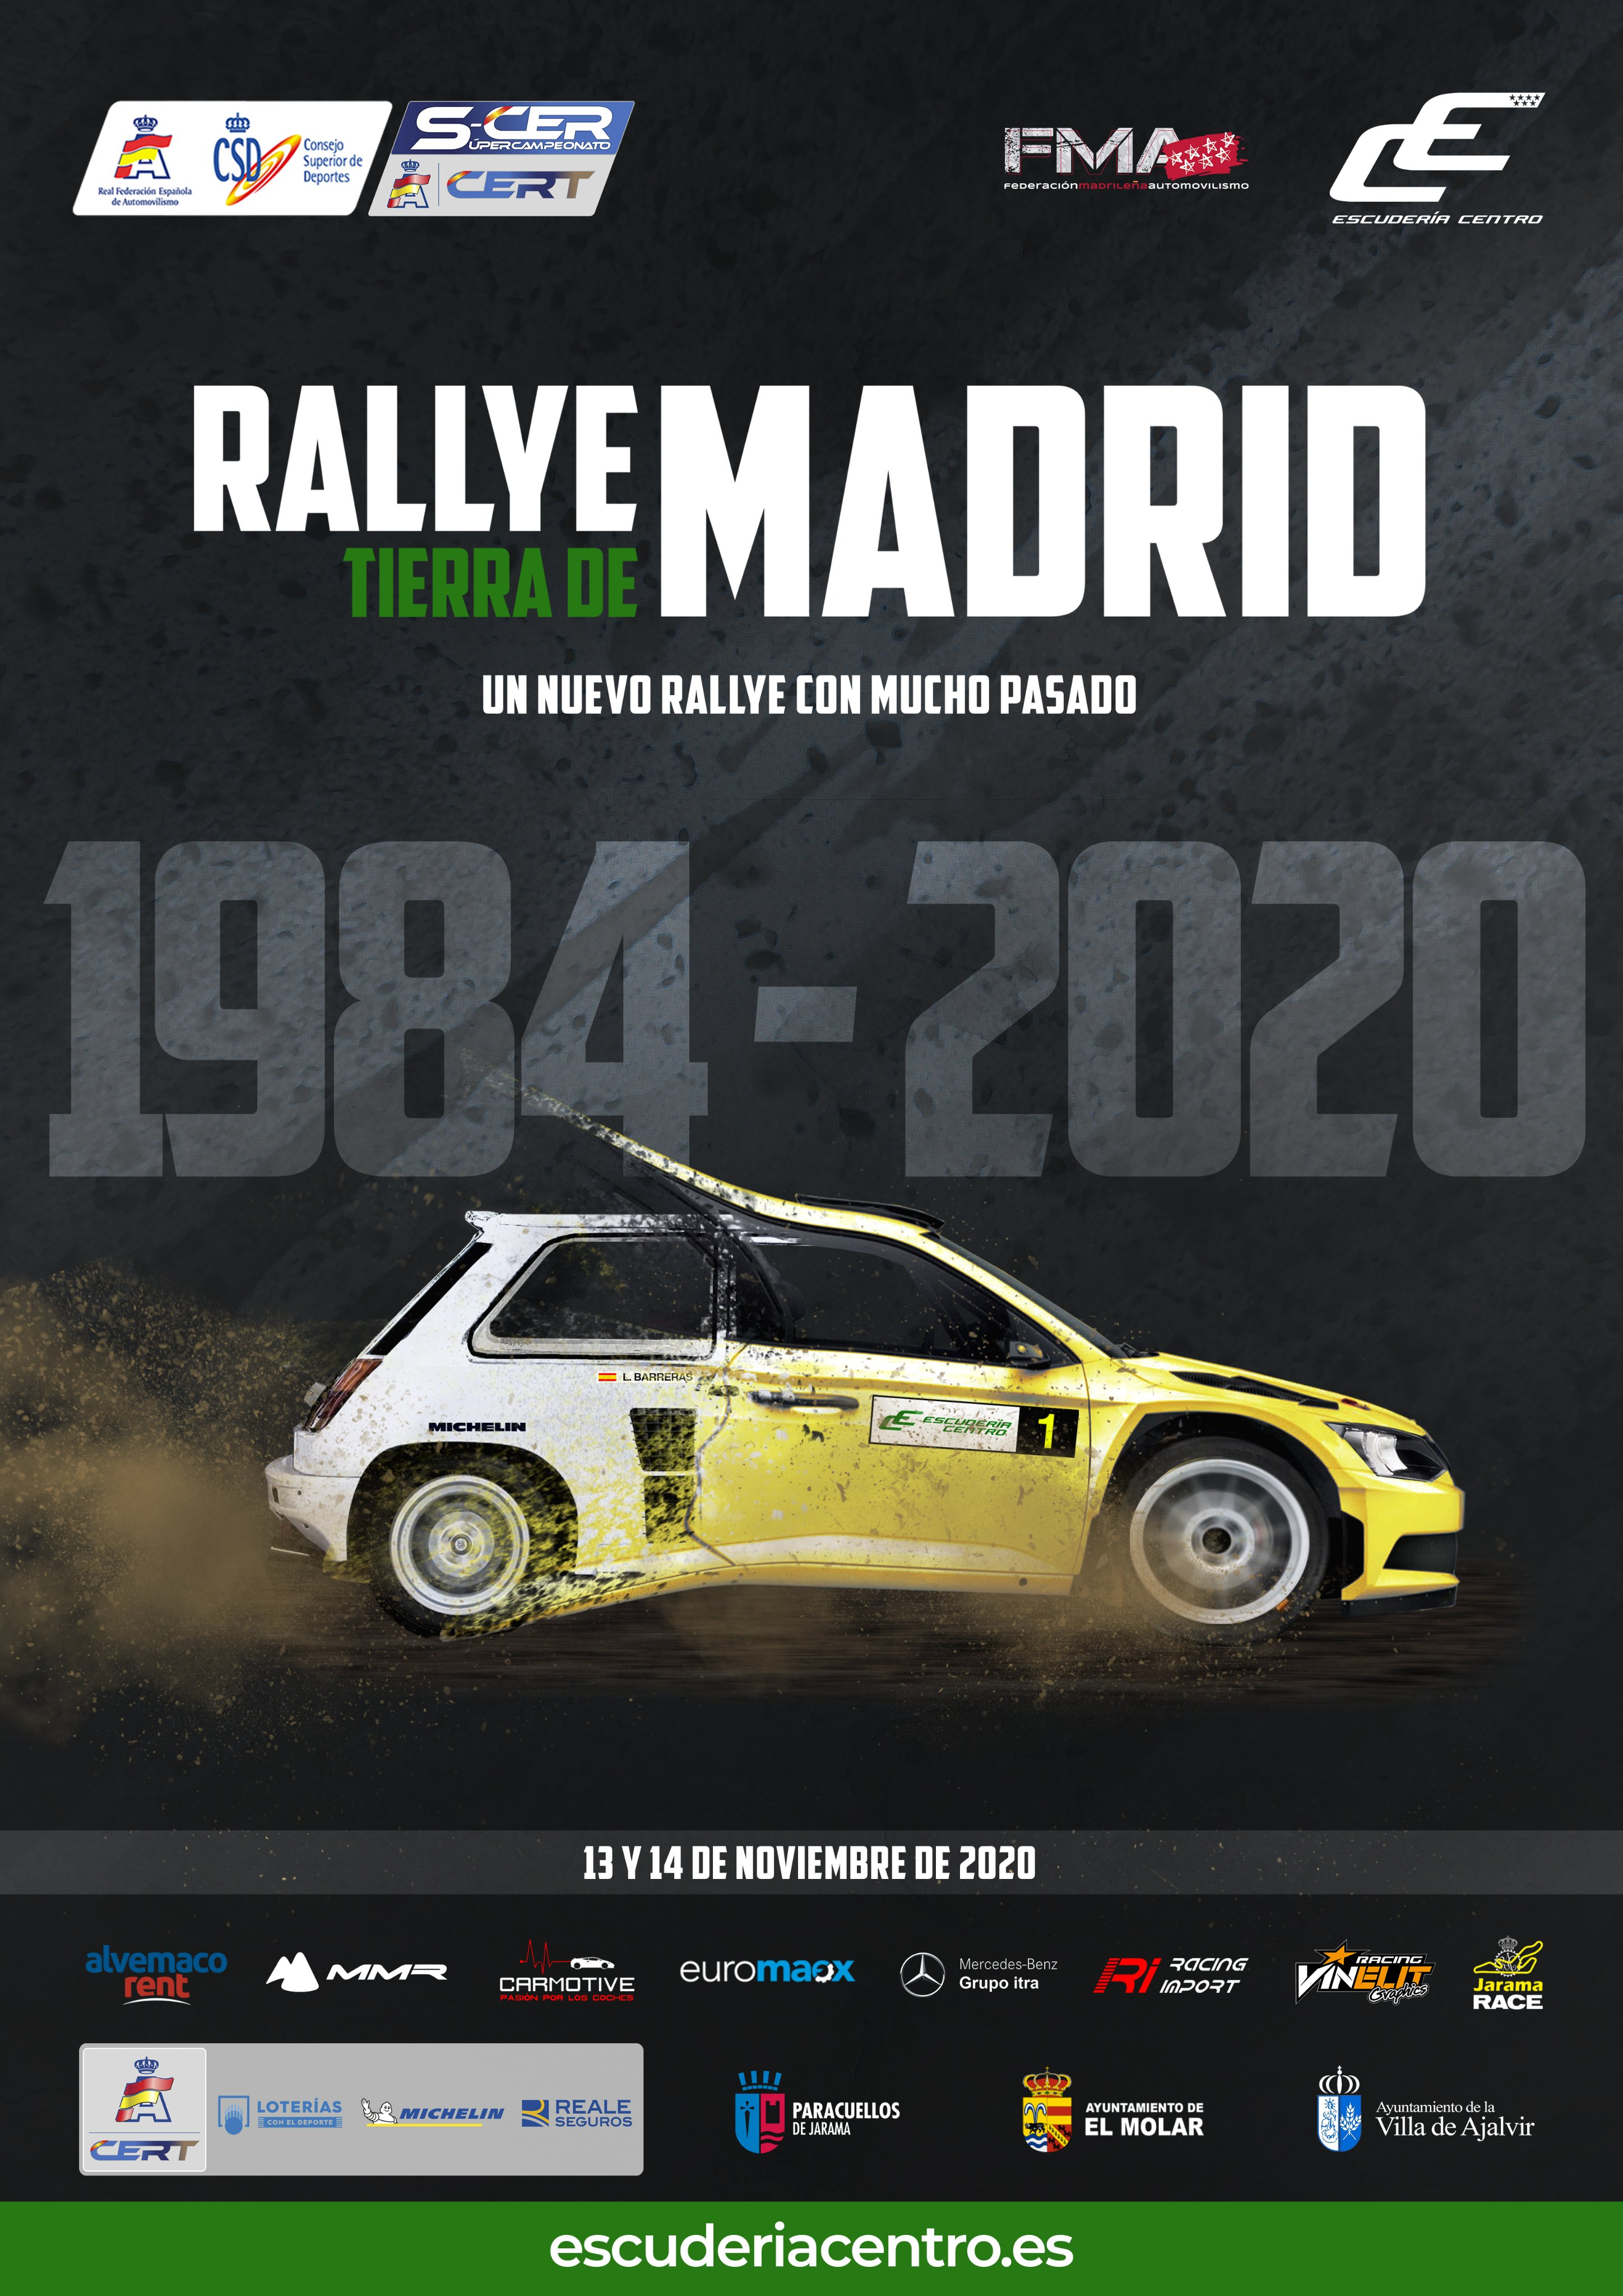 SCER + CERT: Rallye de Tierra de Madrid [13-14 Noviembre] Elwh04pXEAUC5iQ?format=jpg&name=4096x4096